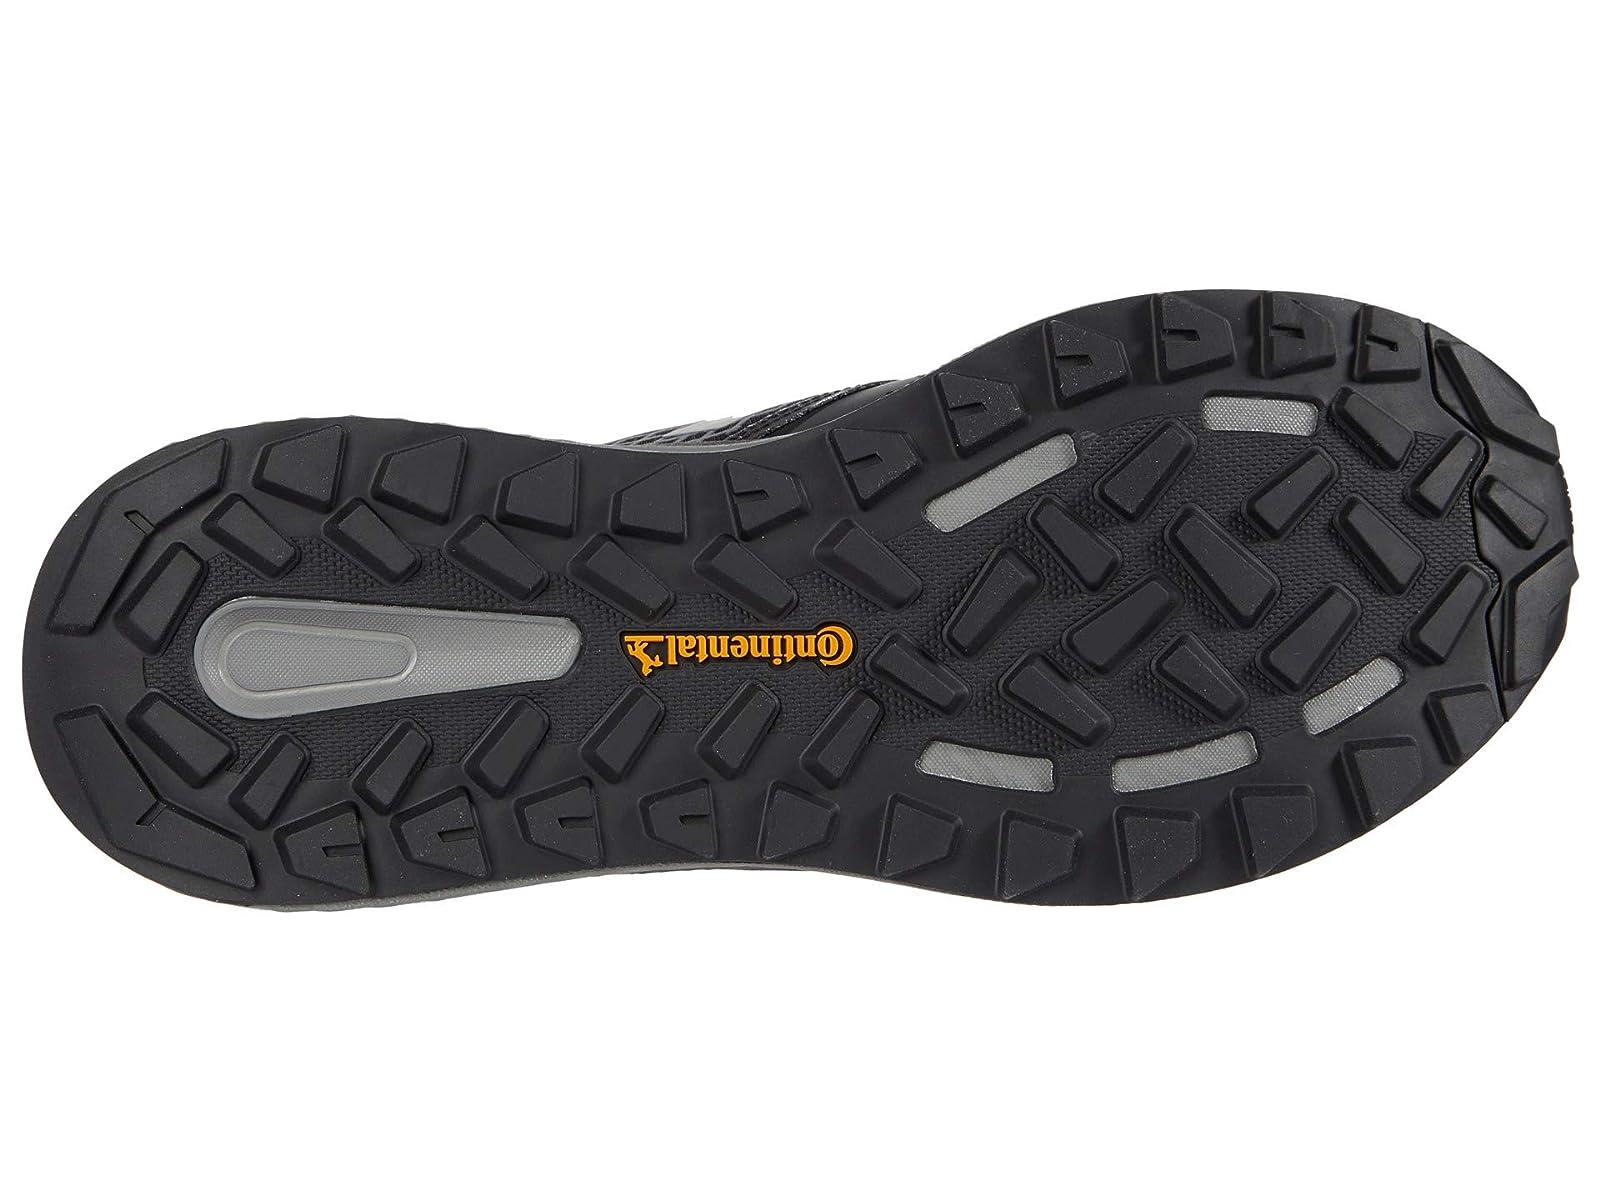 Mannes-Schuhe-Adidas-Outdoor-TERREX-folgian-Hiker-Mid-GTX Indexbild 4